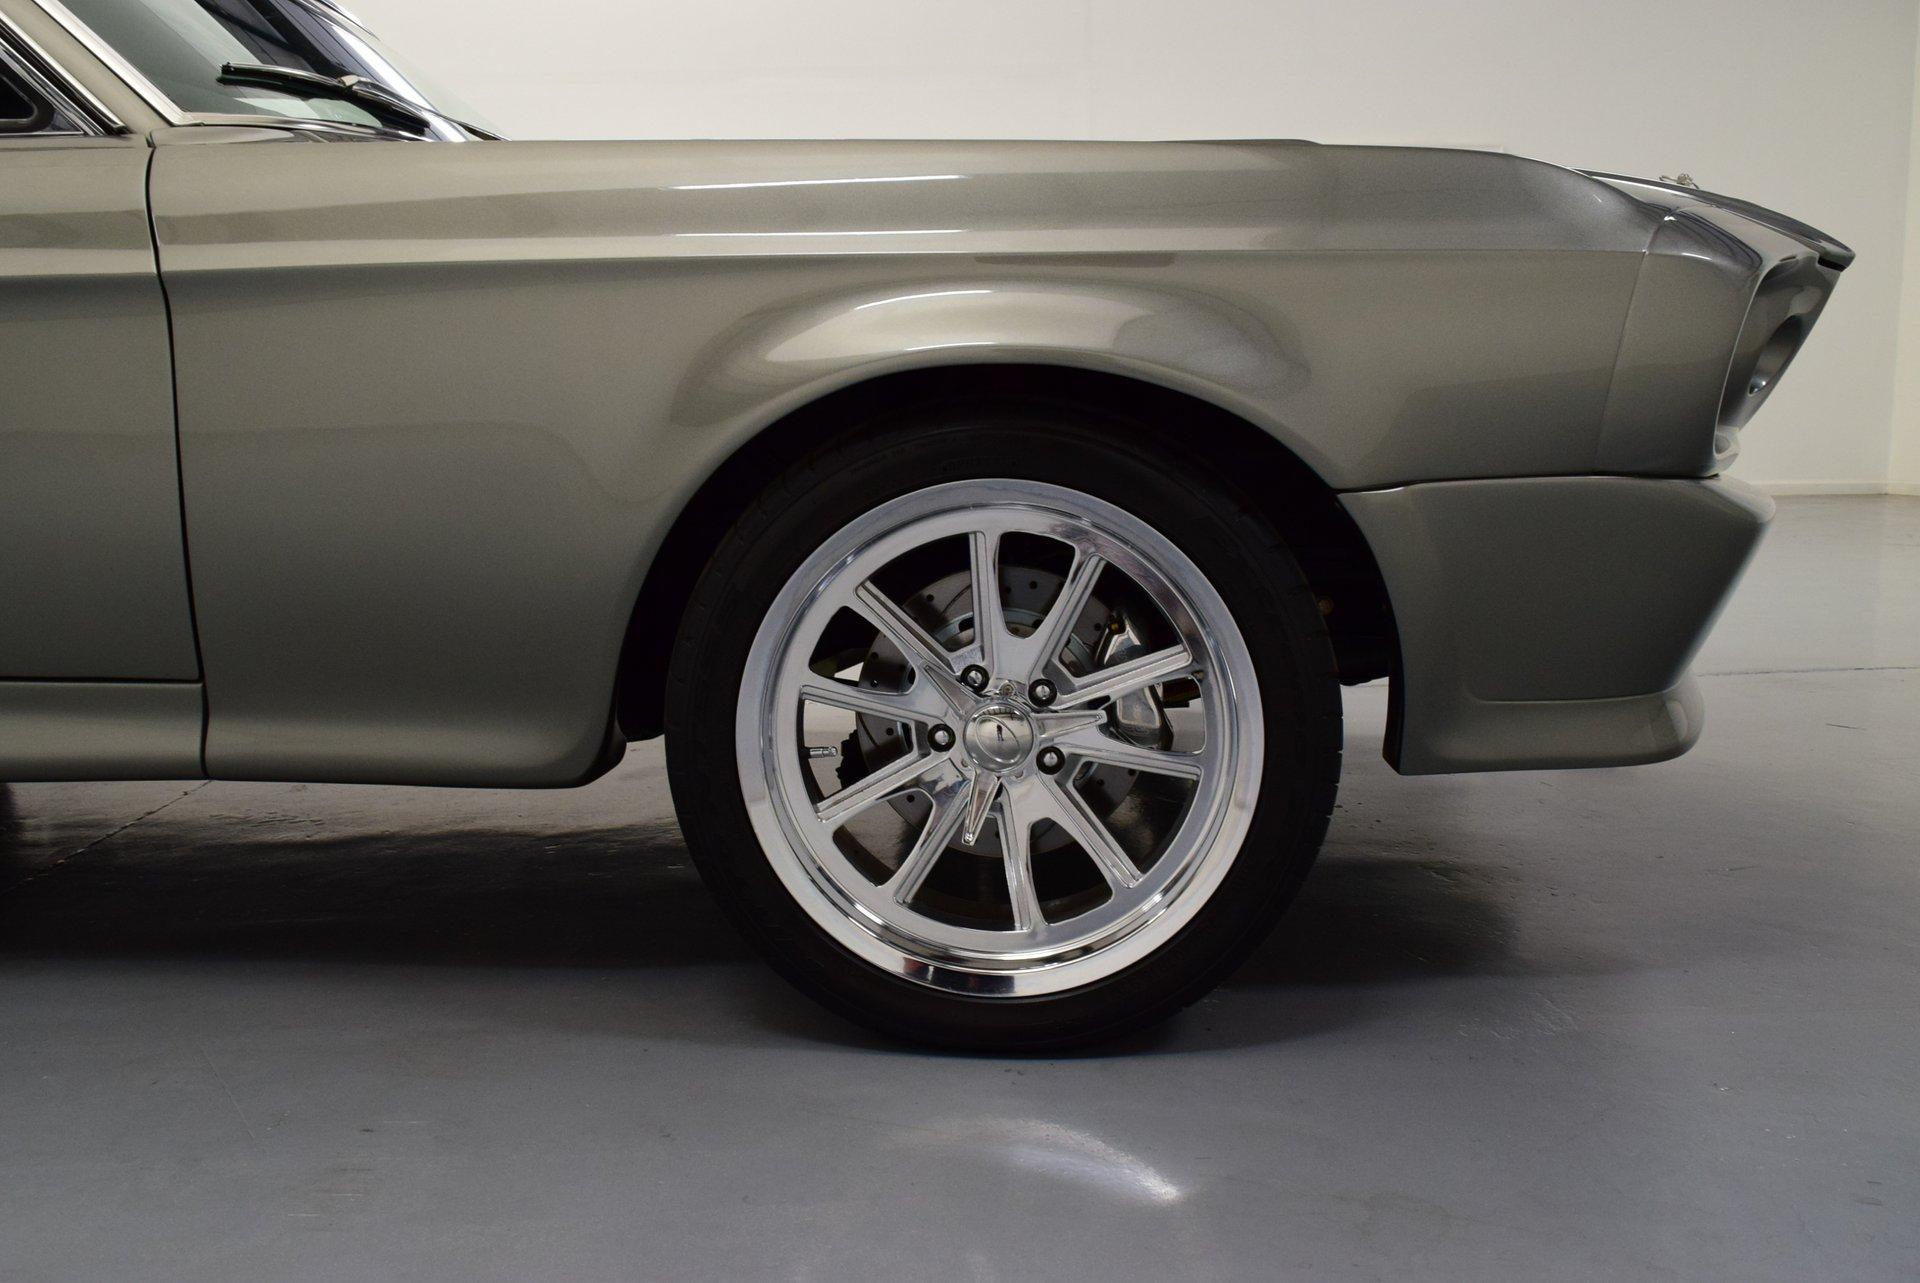 1967 Ford Mustang Shelton Classics Performance